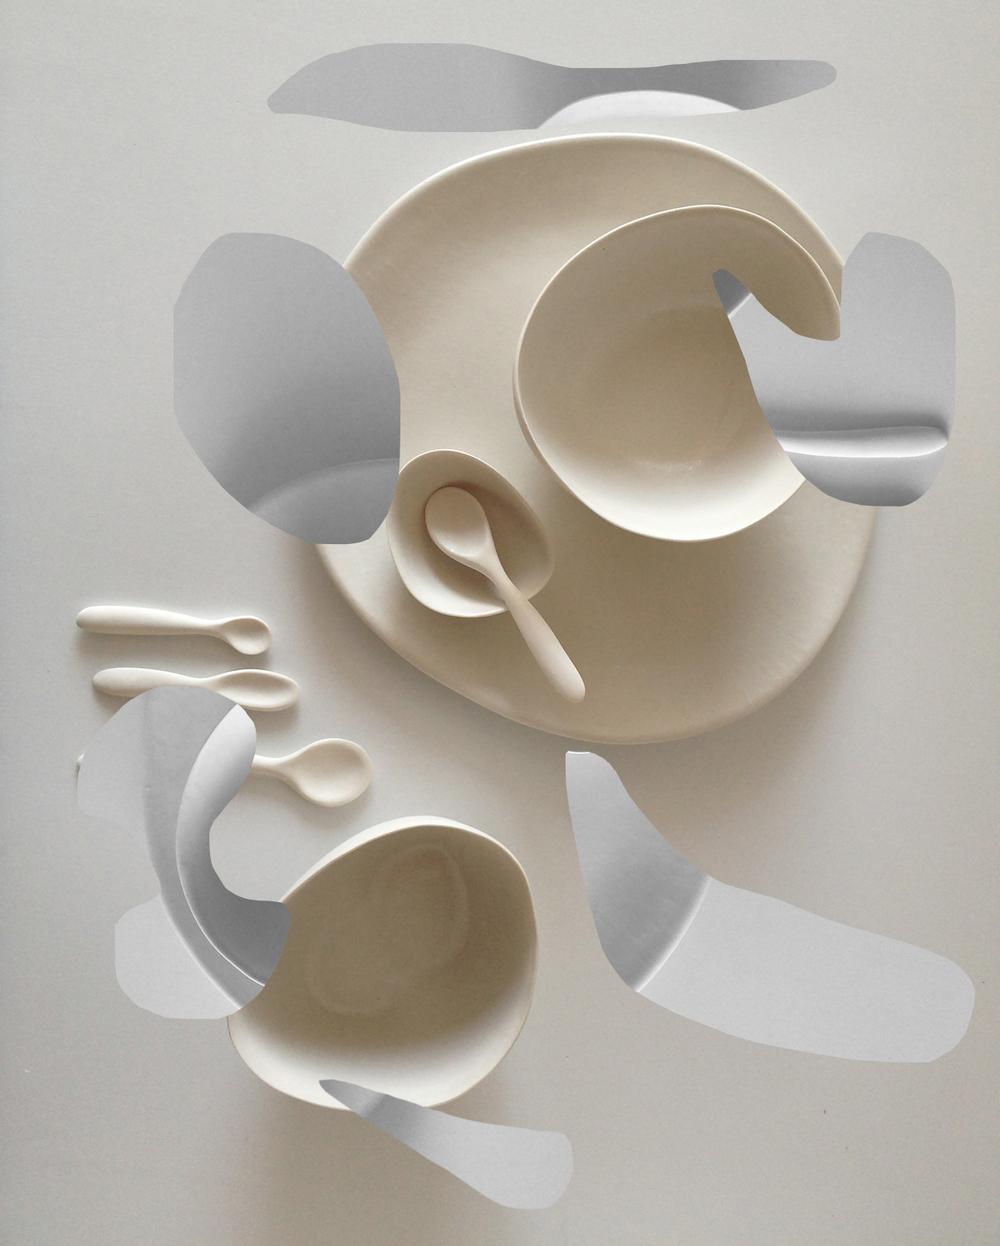 """Benvit"" by Caroline Moore"